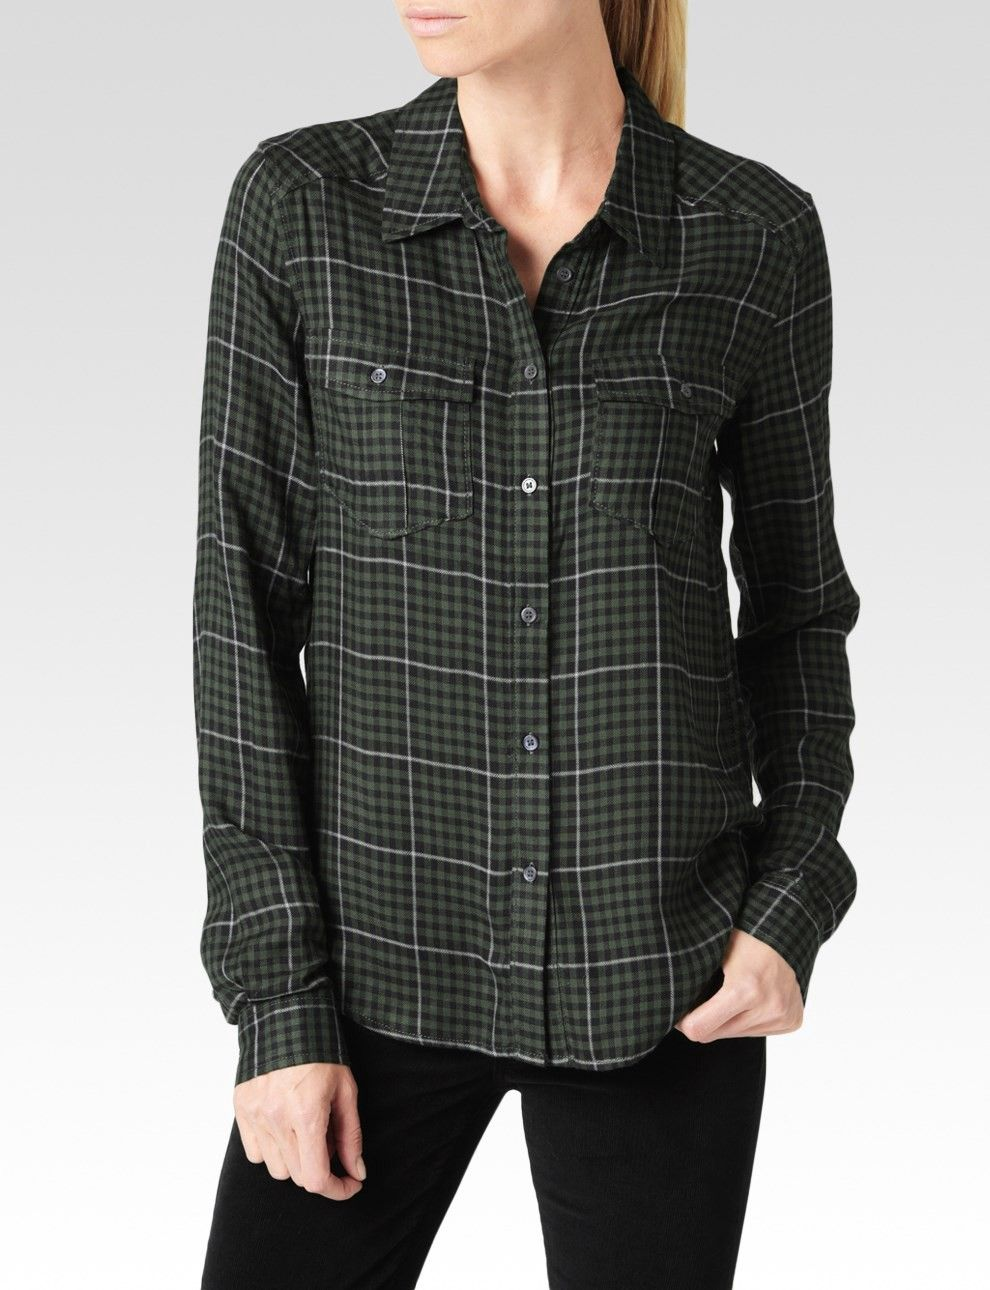 Gangster flannel shirts  PAIGE MYA SHIRT  BLACKARMYGREY HARTFORD PLAID paige cloth